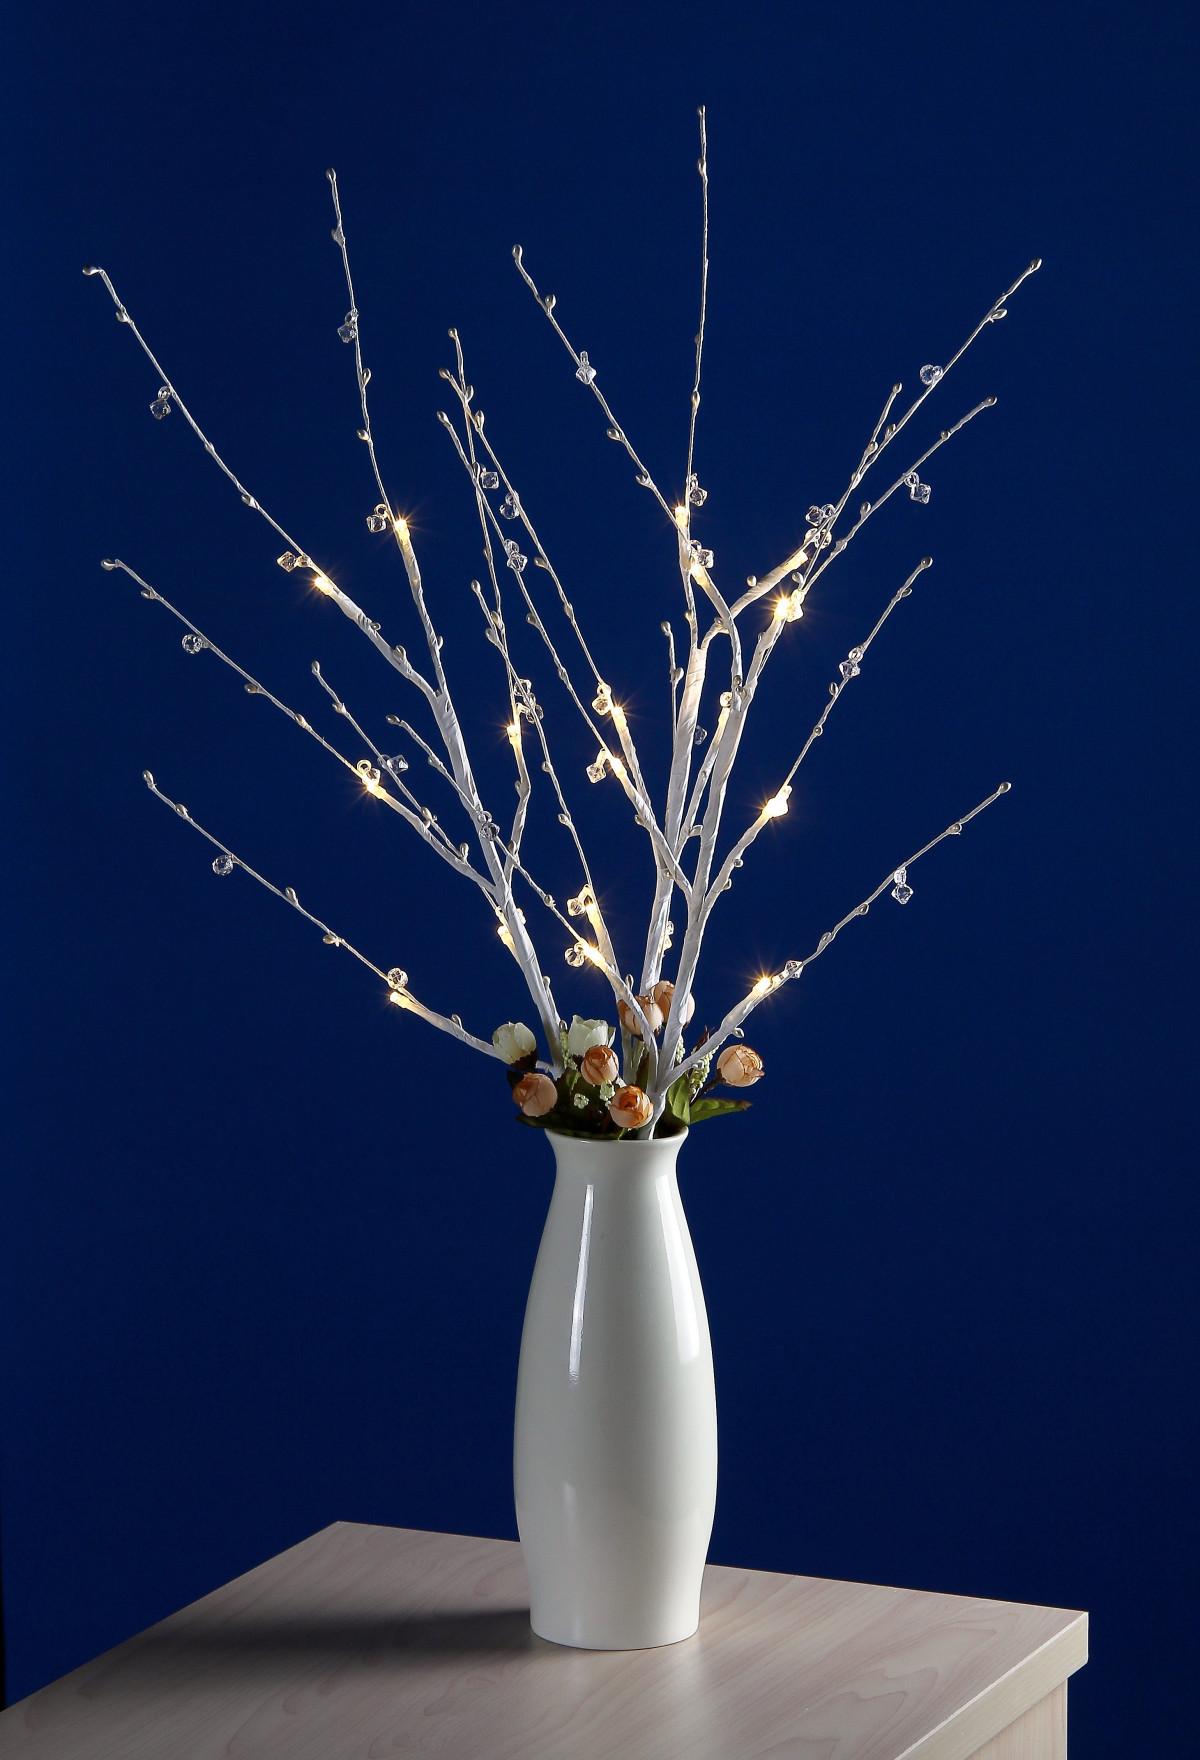 Mraz-zamrznuto u vremenu! - Page 6 Led_lights_led_flower_ornaments_led_closeup_flower_close_up_crystal_flower-985377